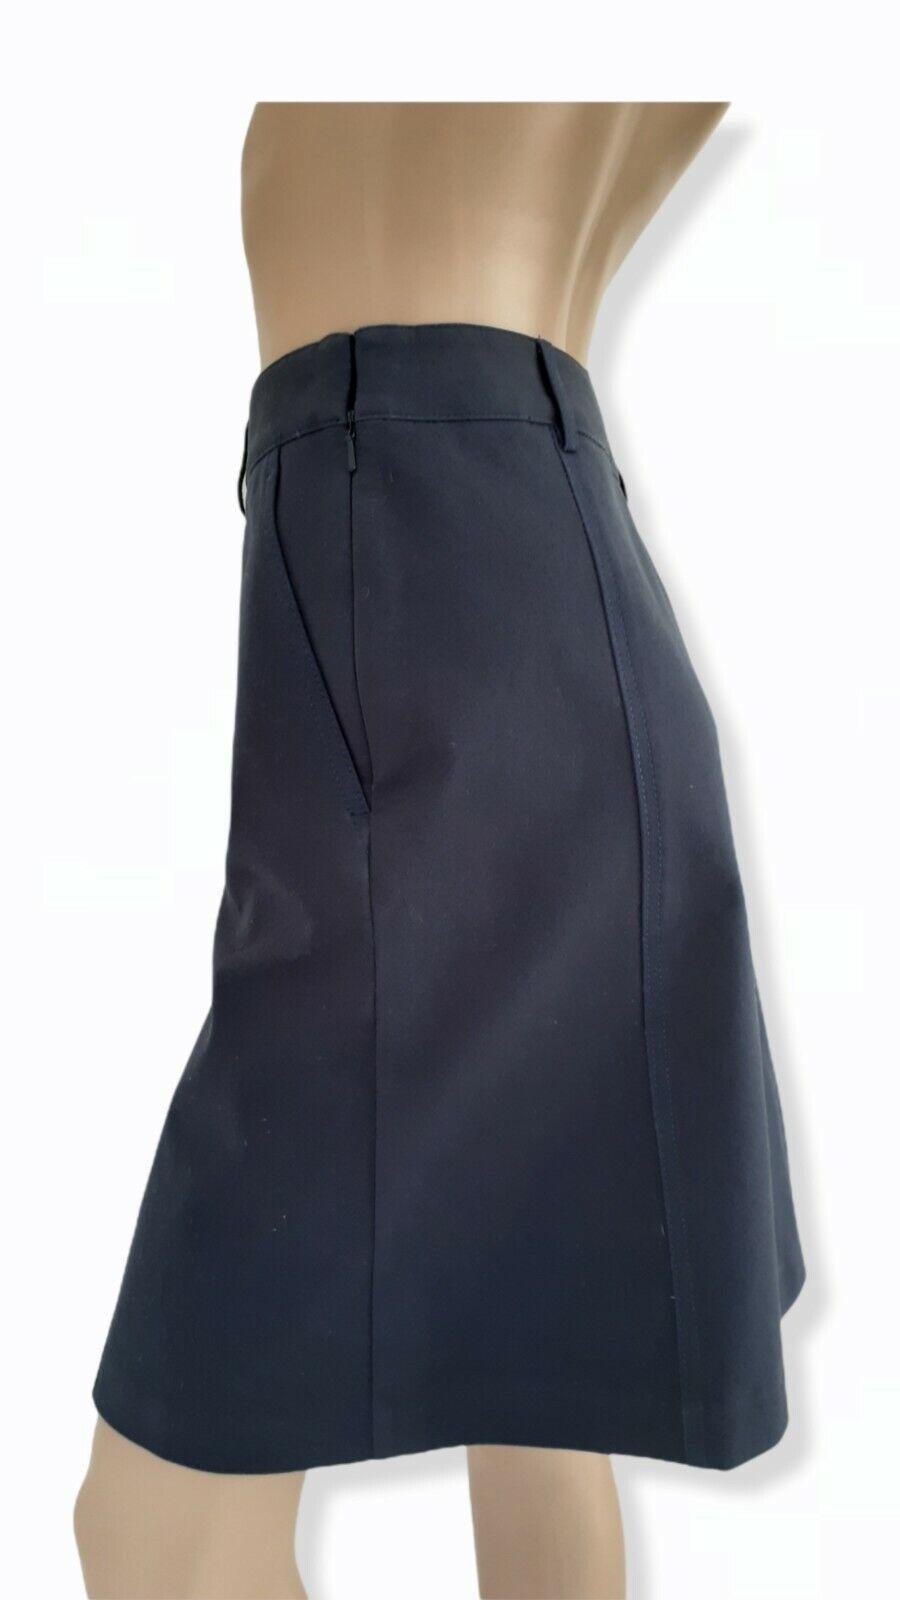 J McLaughlin Teal Button Front A Line Skirt Size 2 - image 2